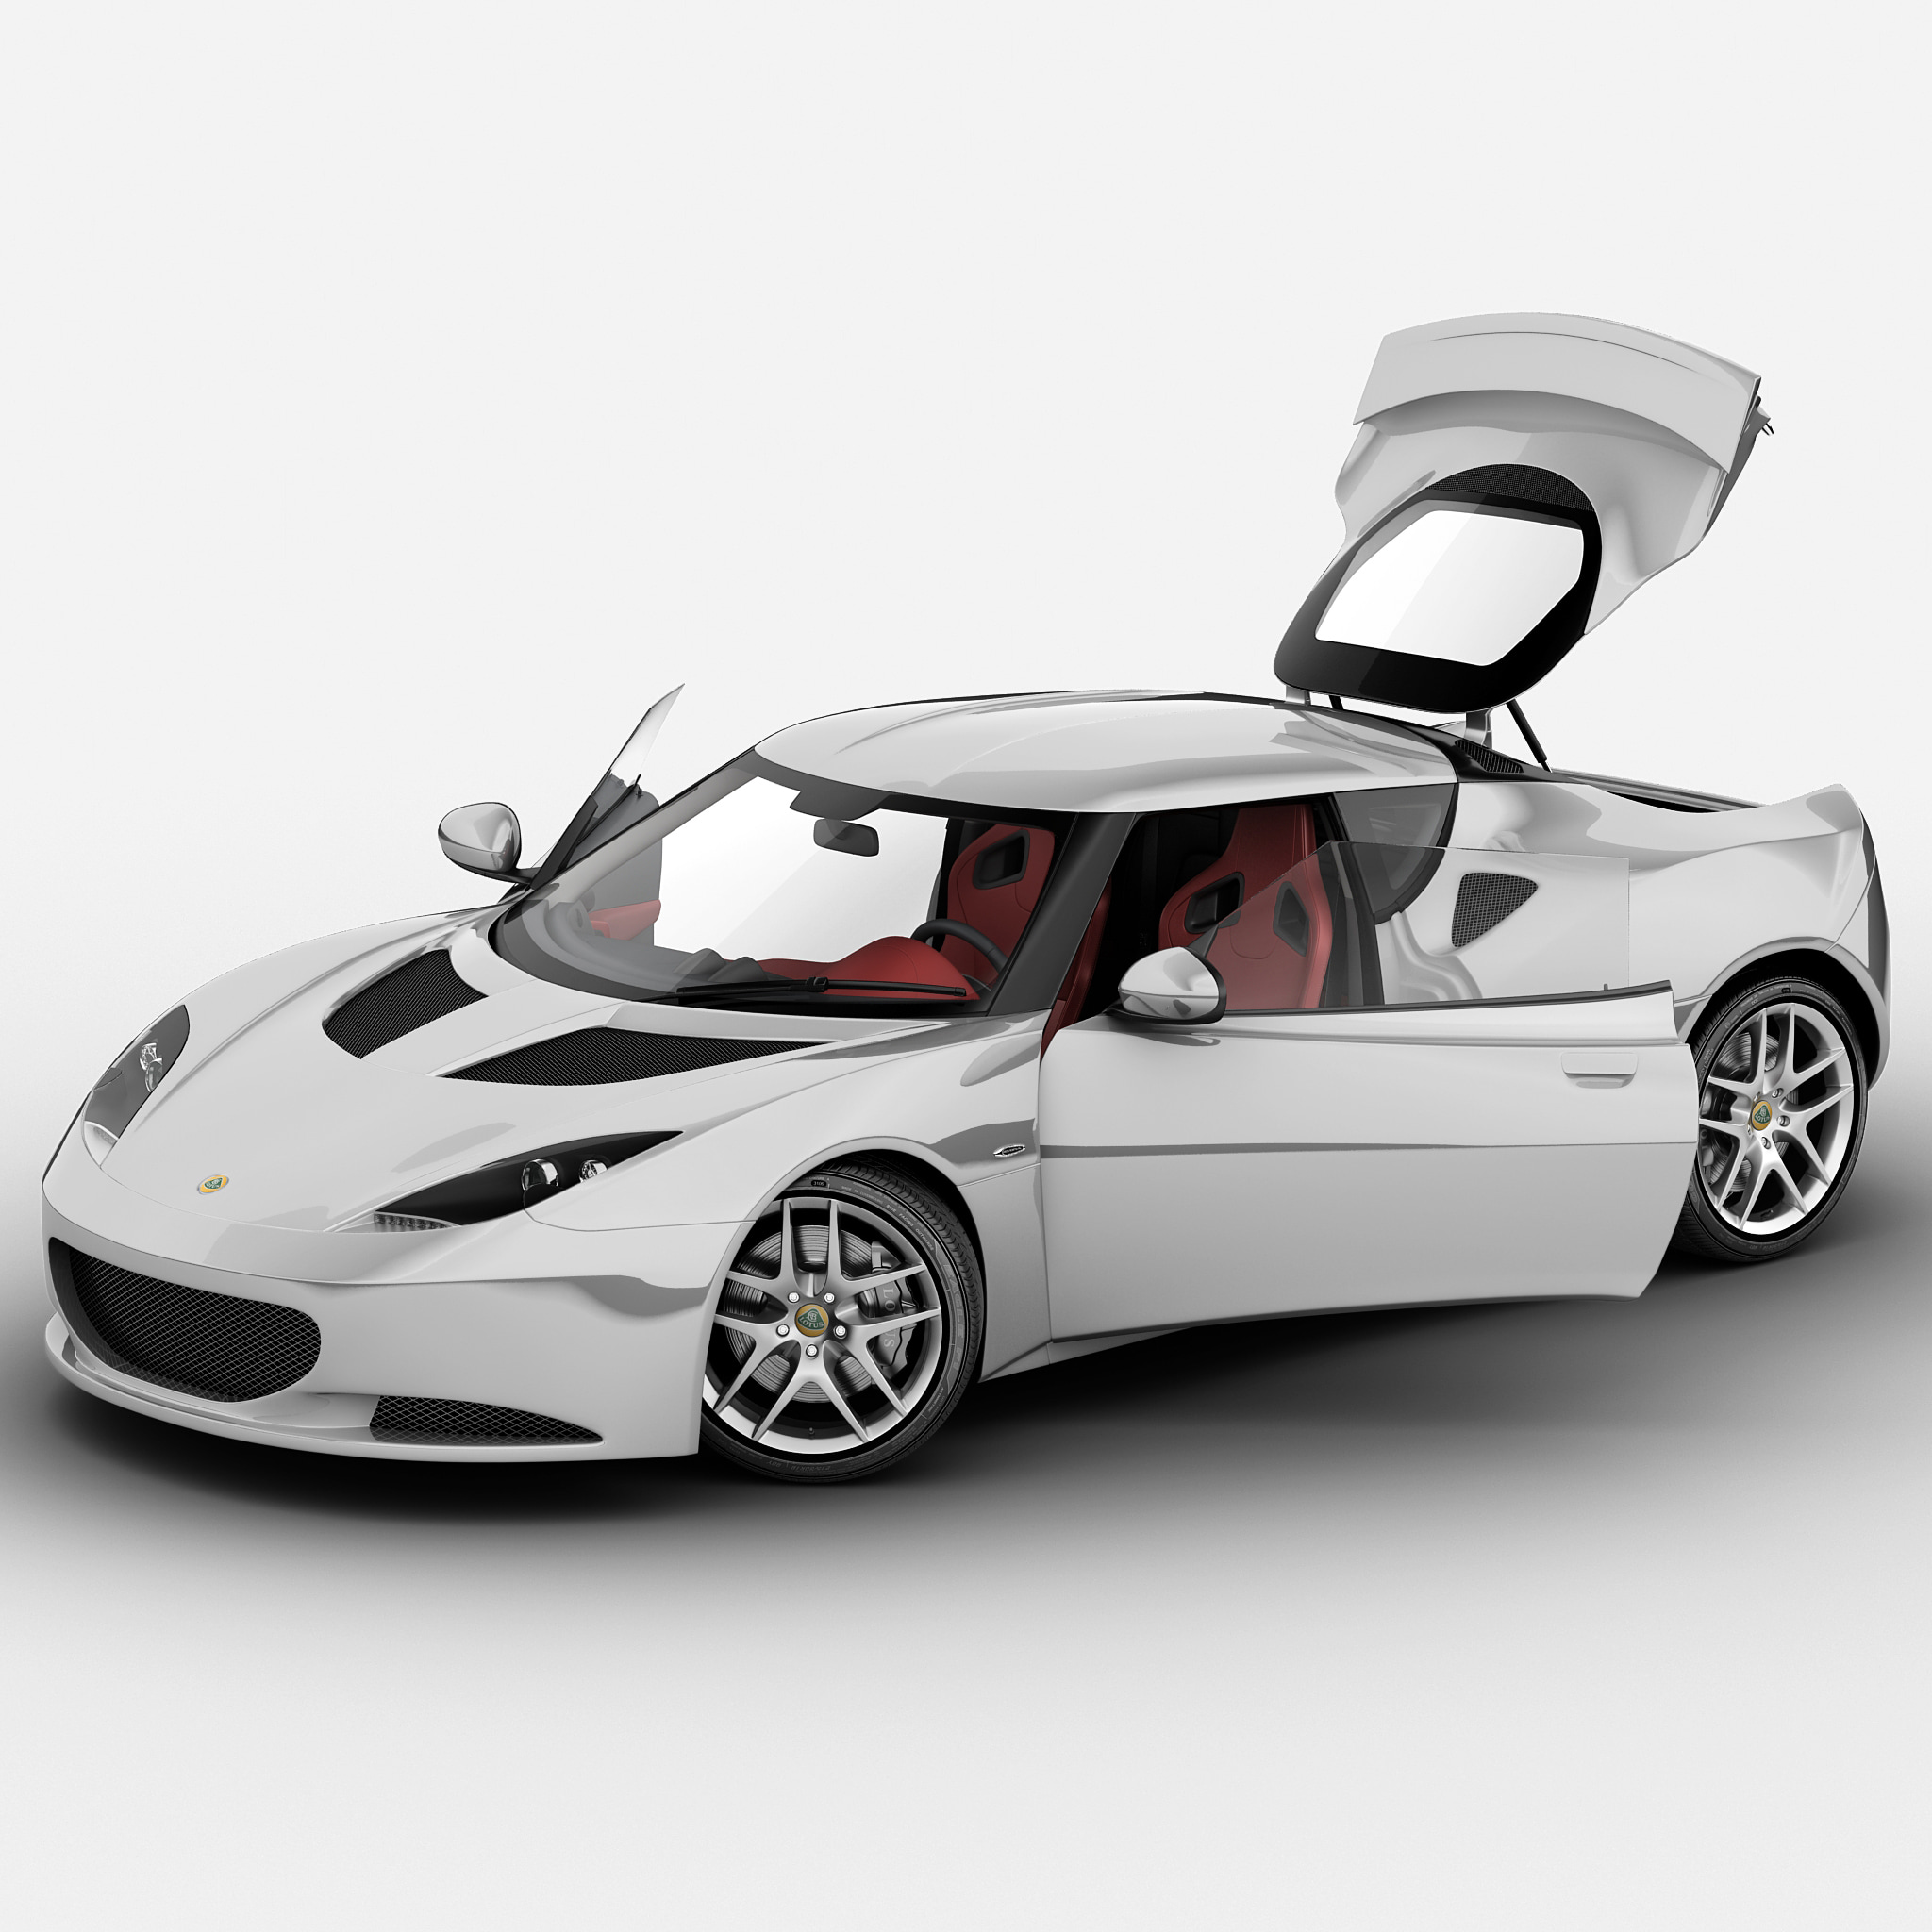 Lotus Evora S 2013 Rigged_28.jpg